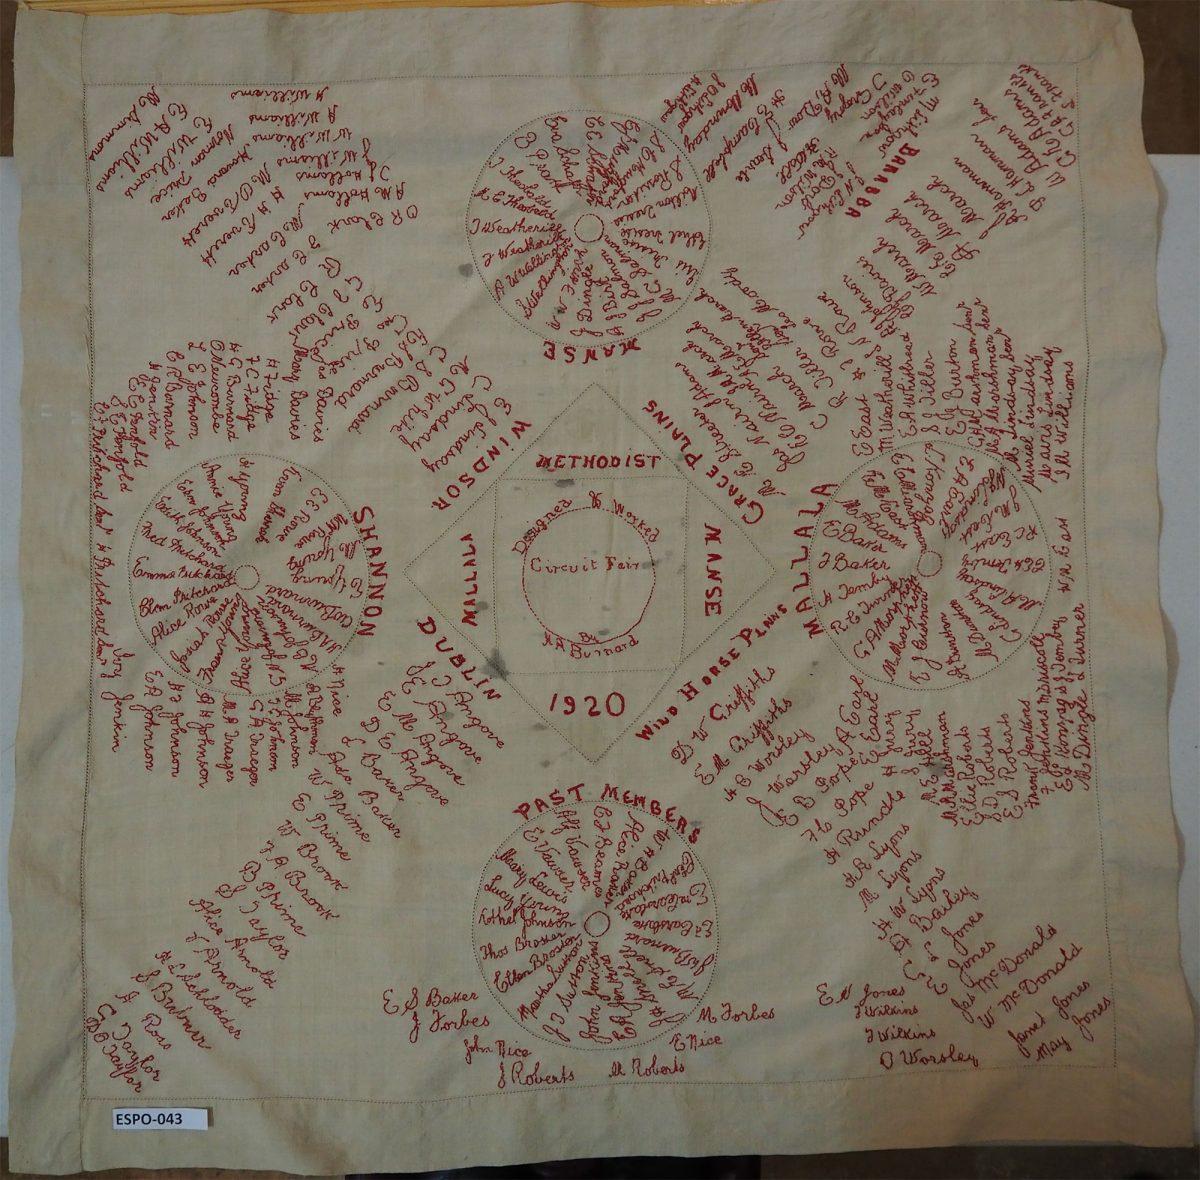 Mallala Methodist Manse 1920: Cloth